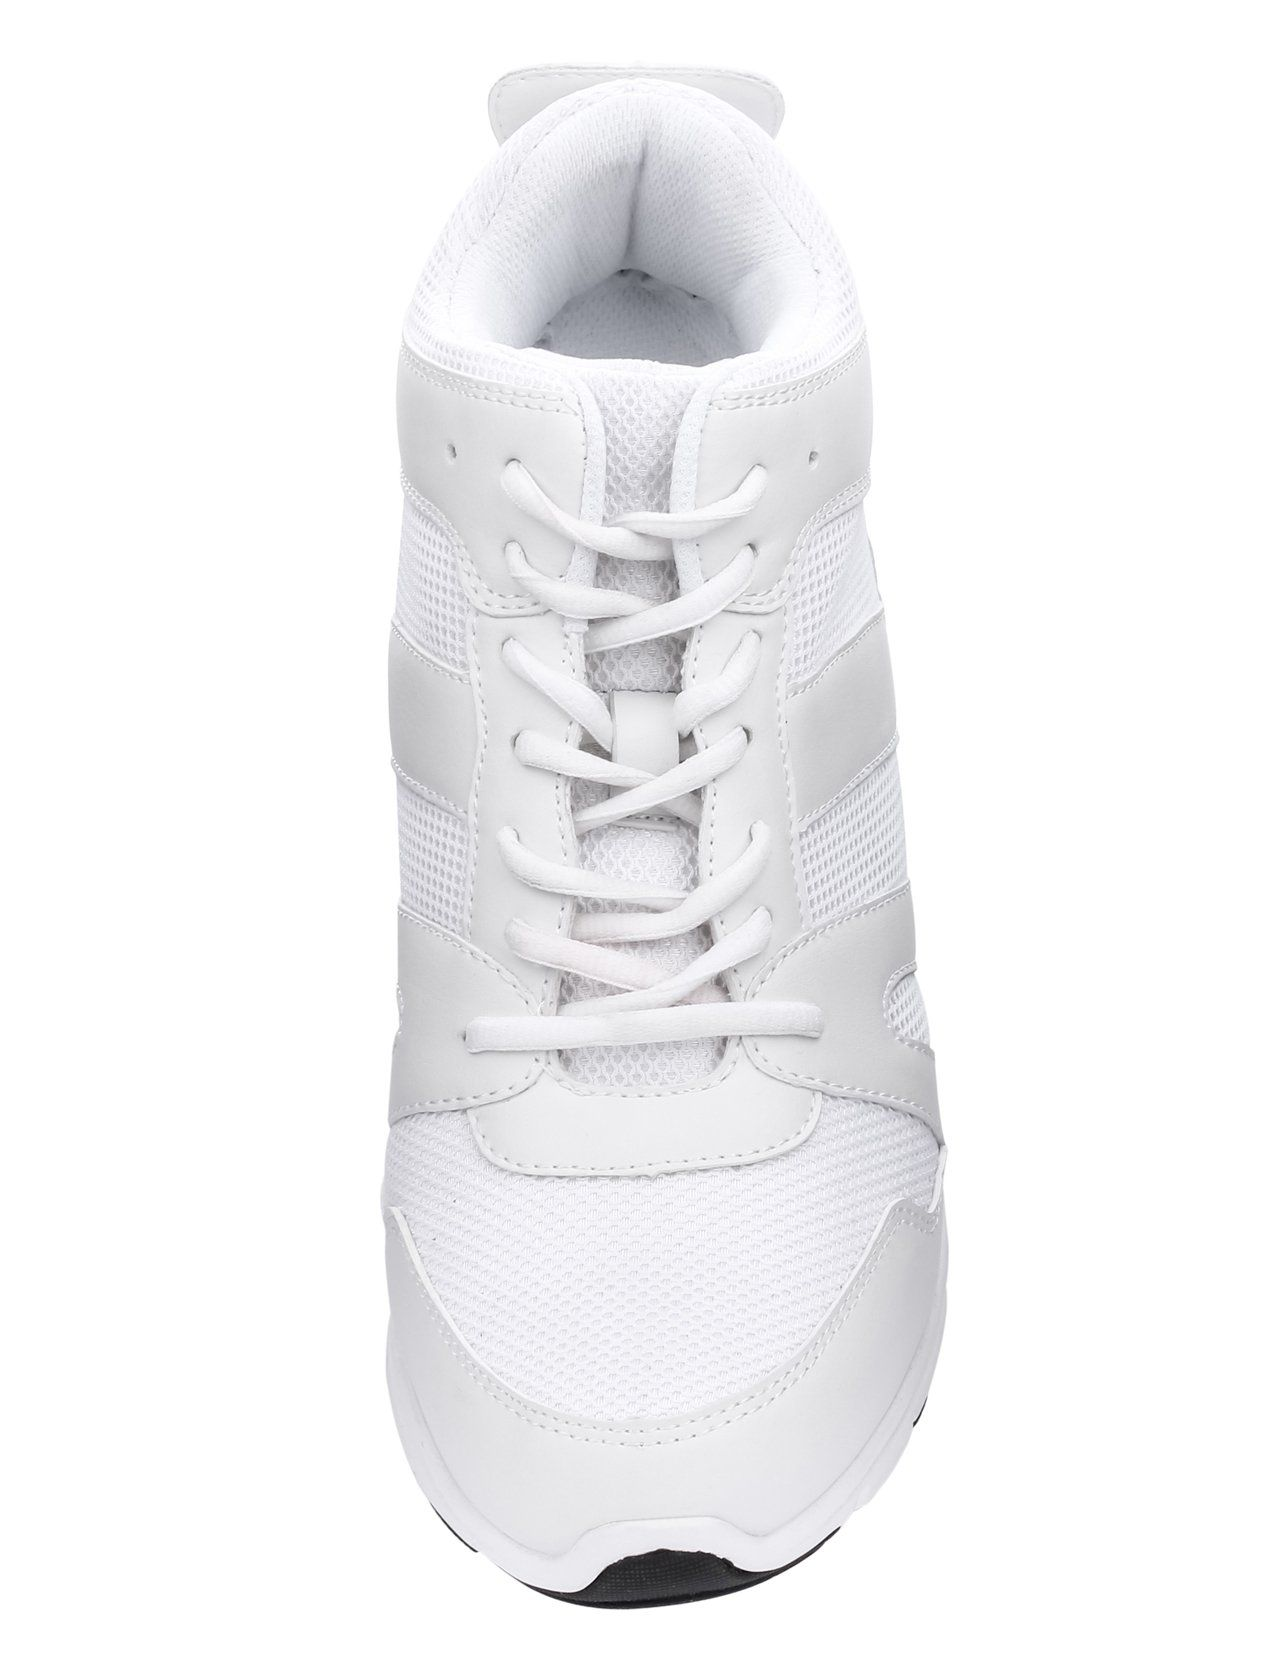 CALTO G3329-4 Inches Elevator Height Increase Mesh Sporty Glacier Blue Sneaker